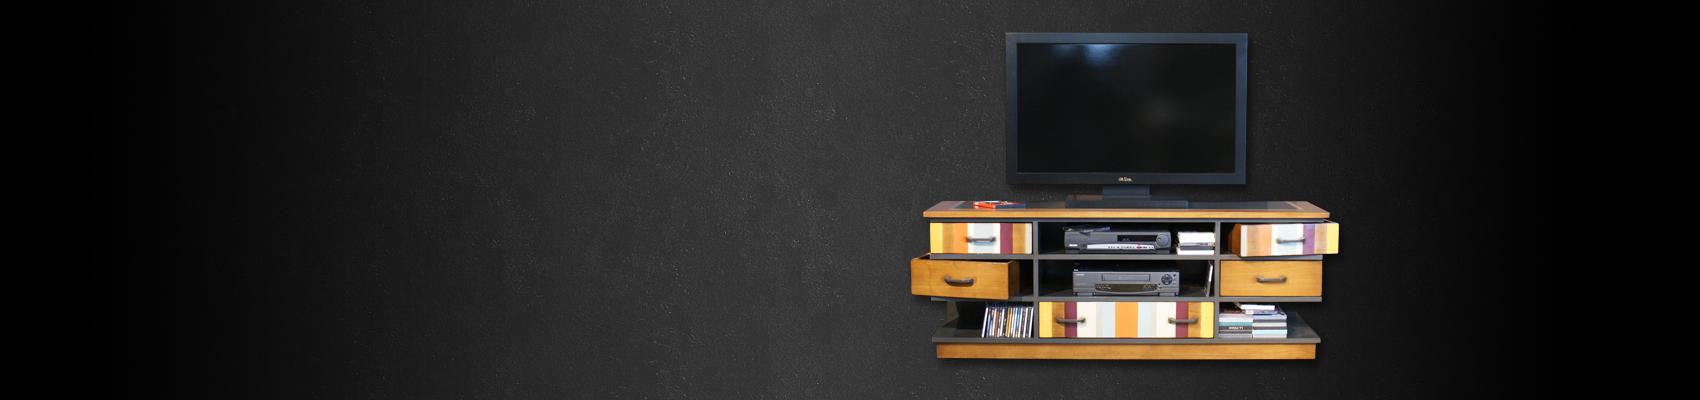 Meuble Tv Qui Rentre : Meuble Tv